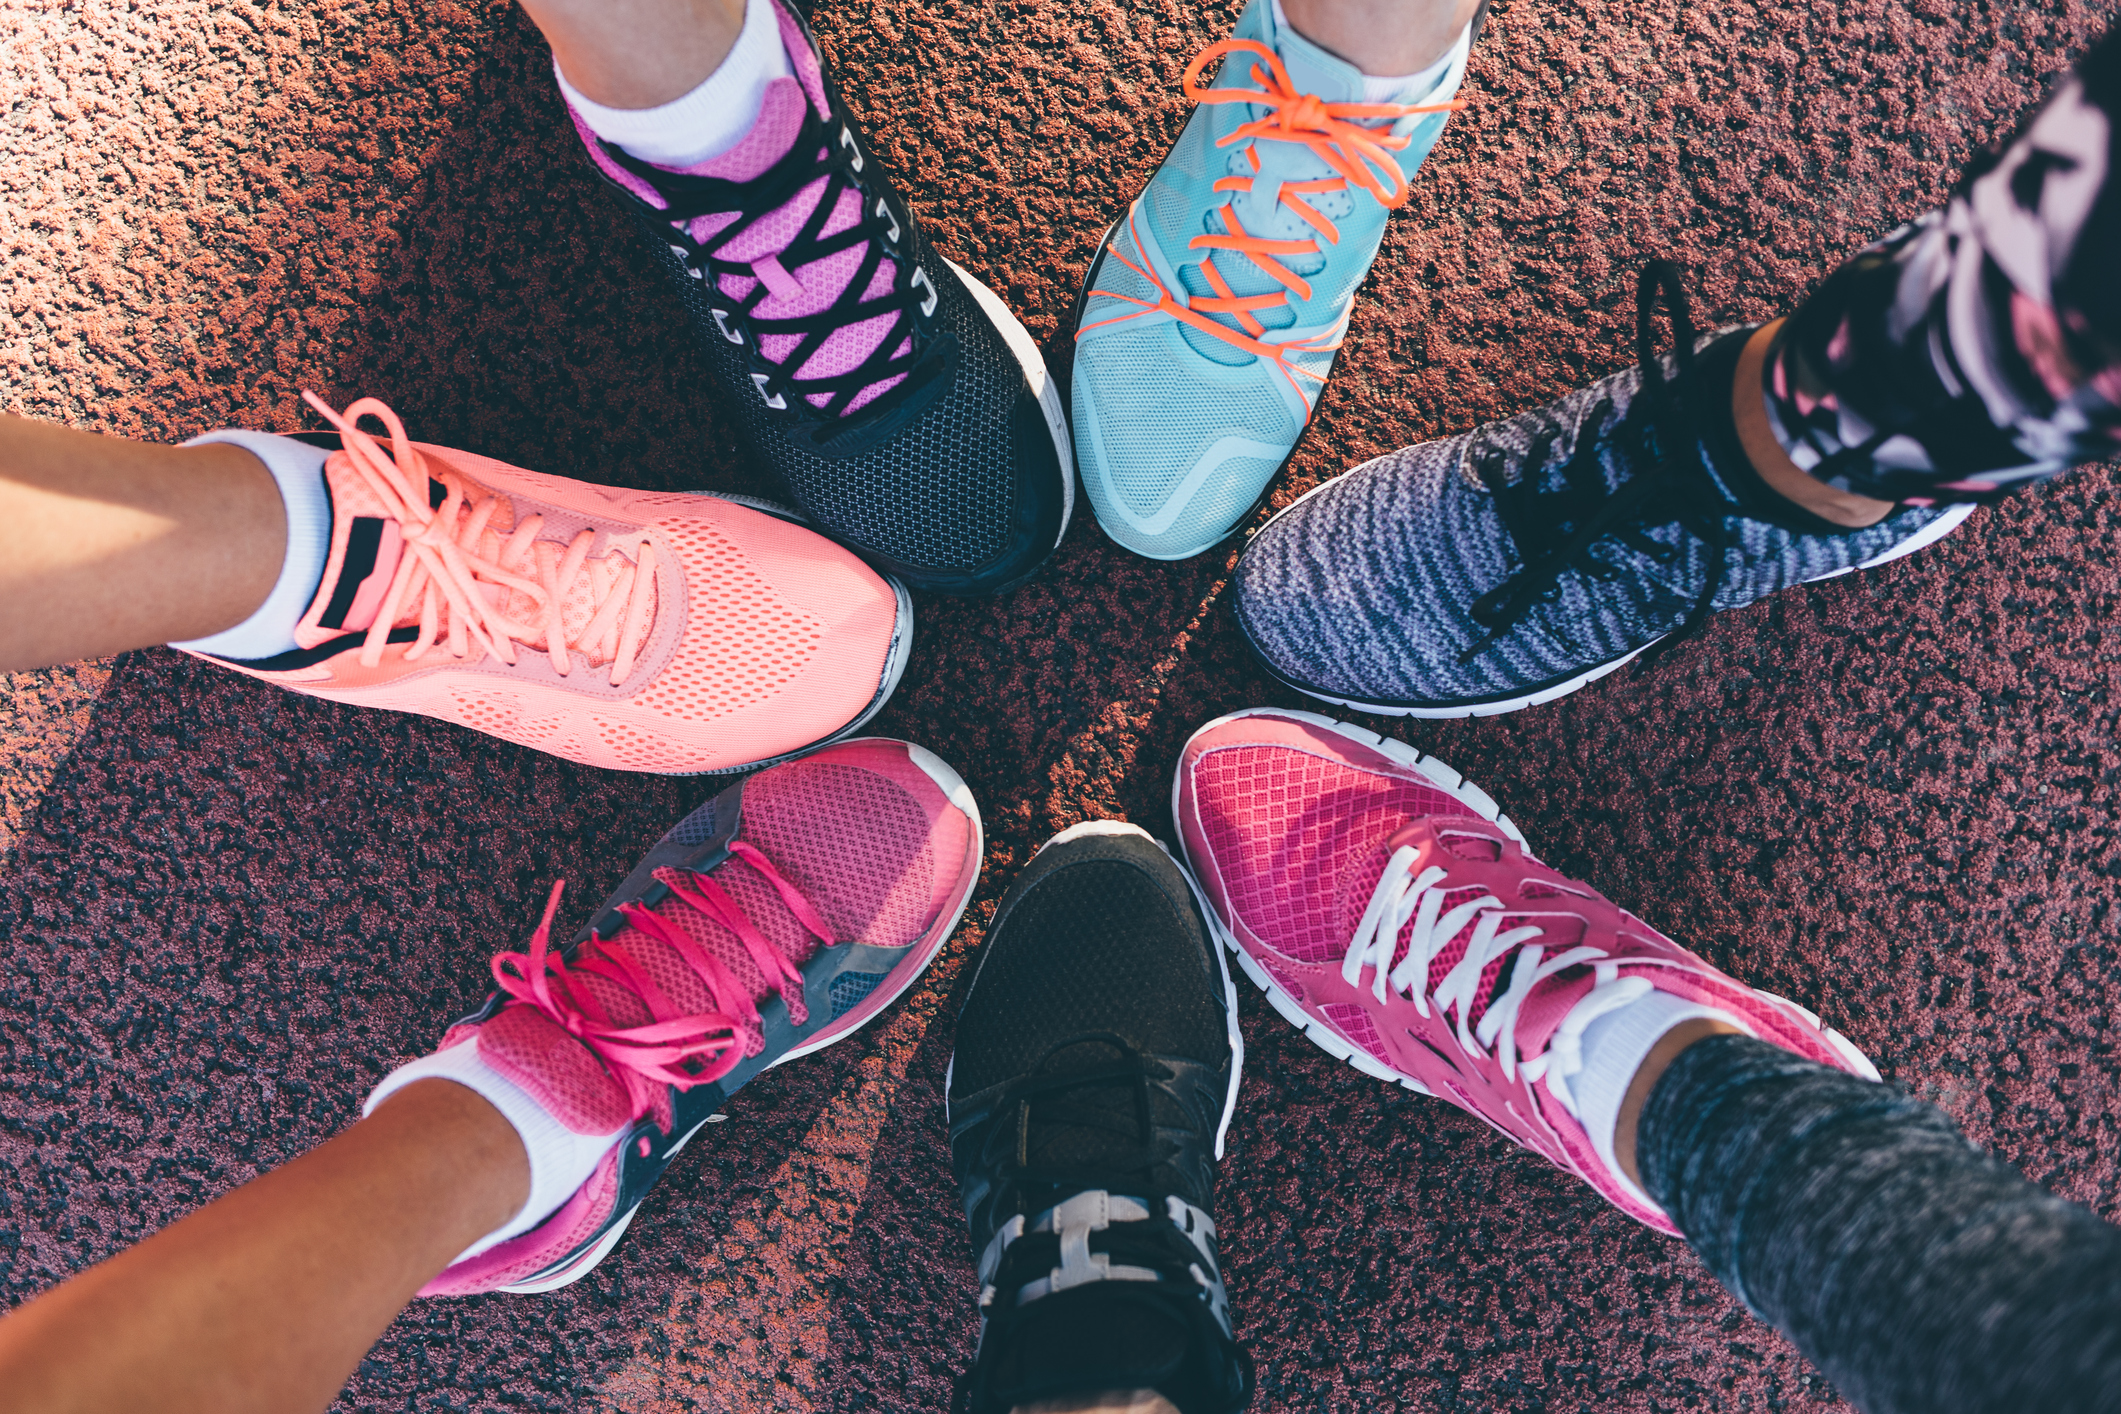 Legs of athletes (Thinkstock/PA)